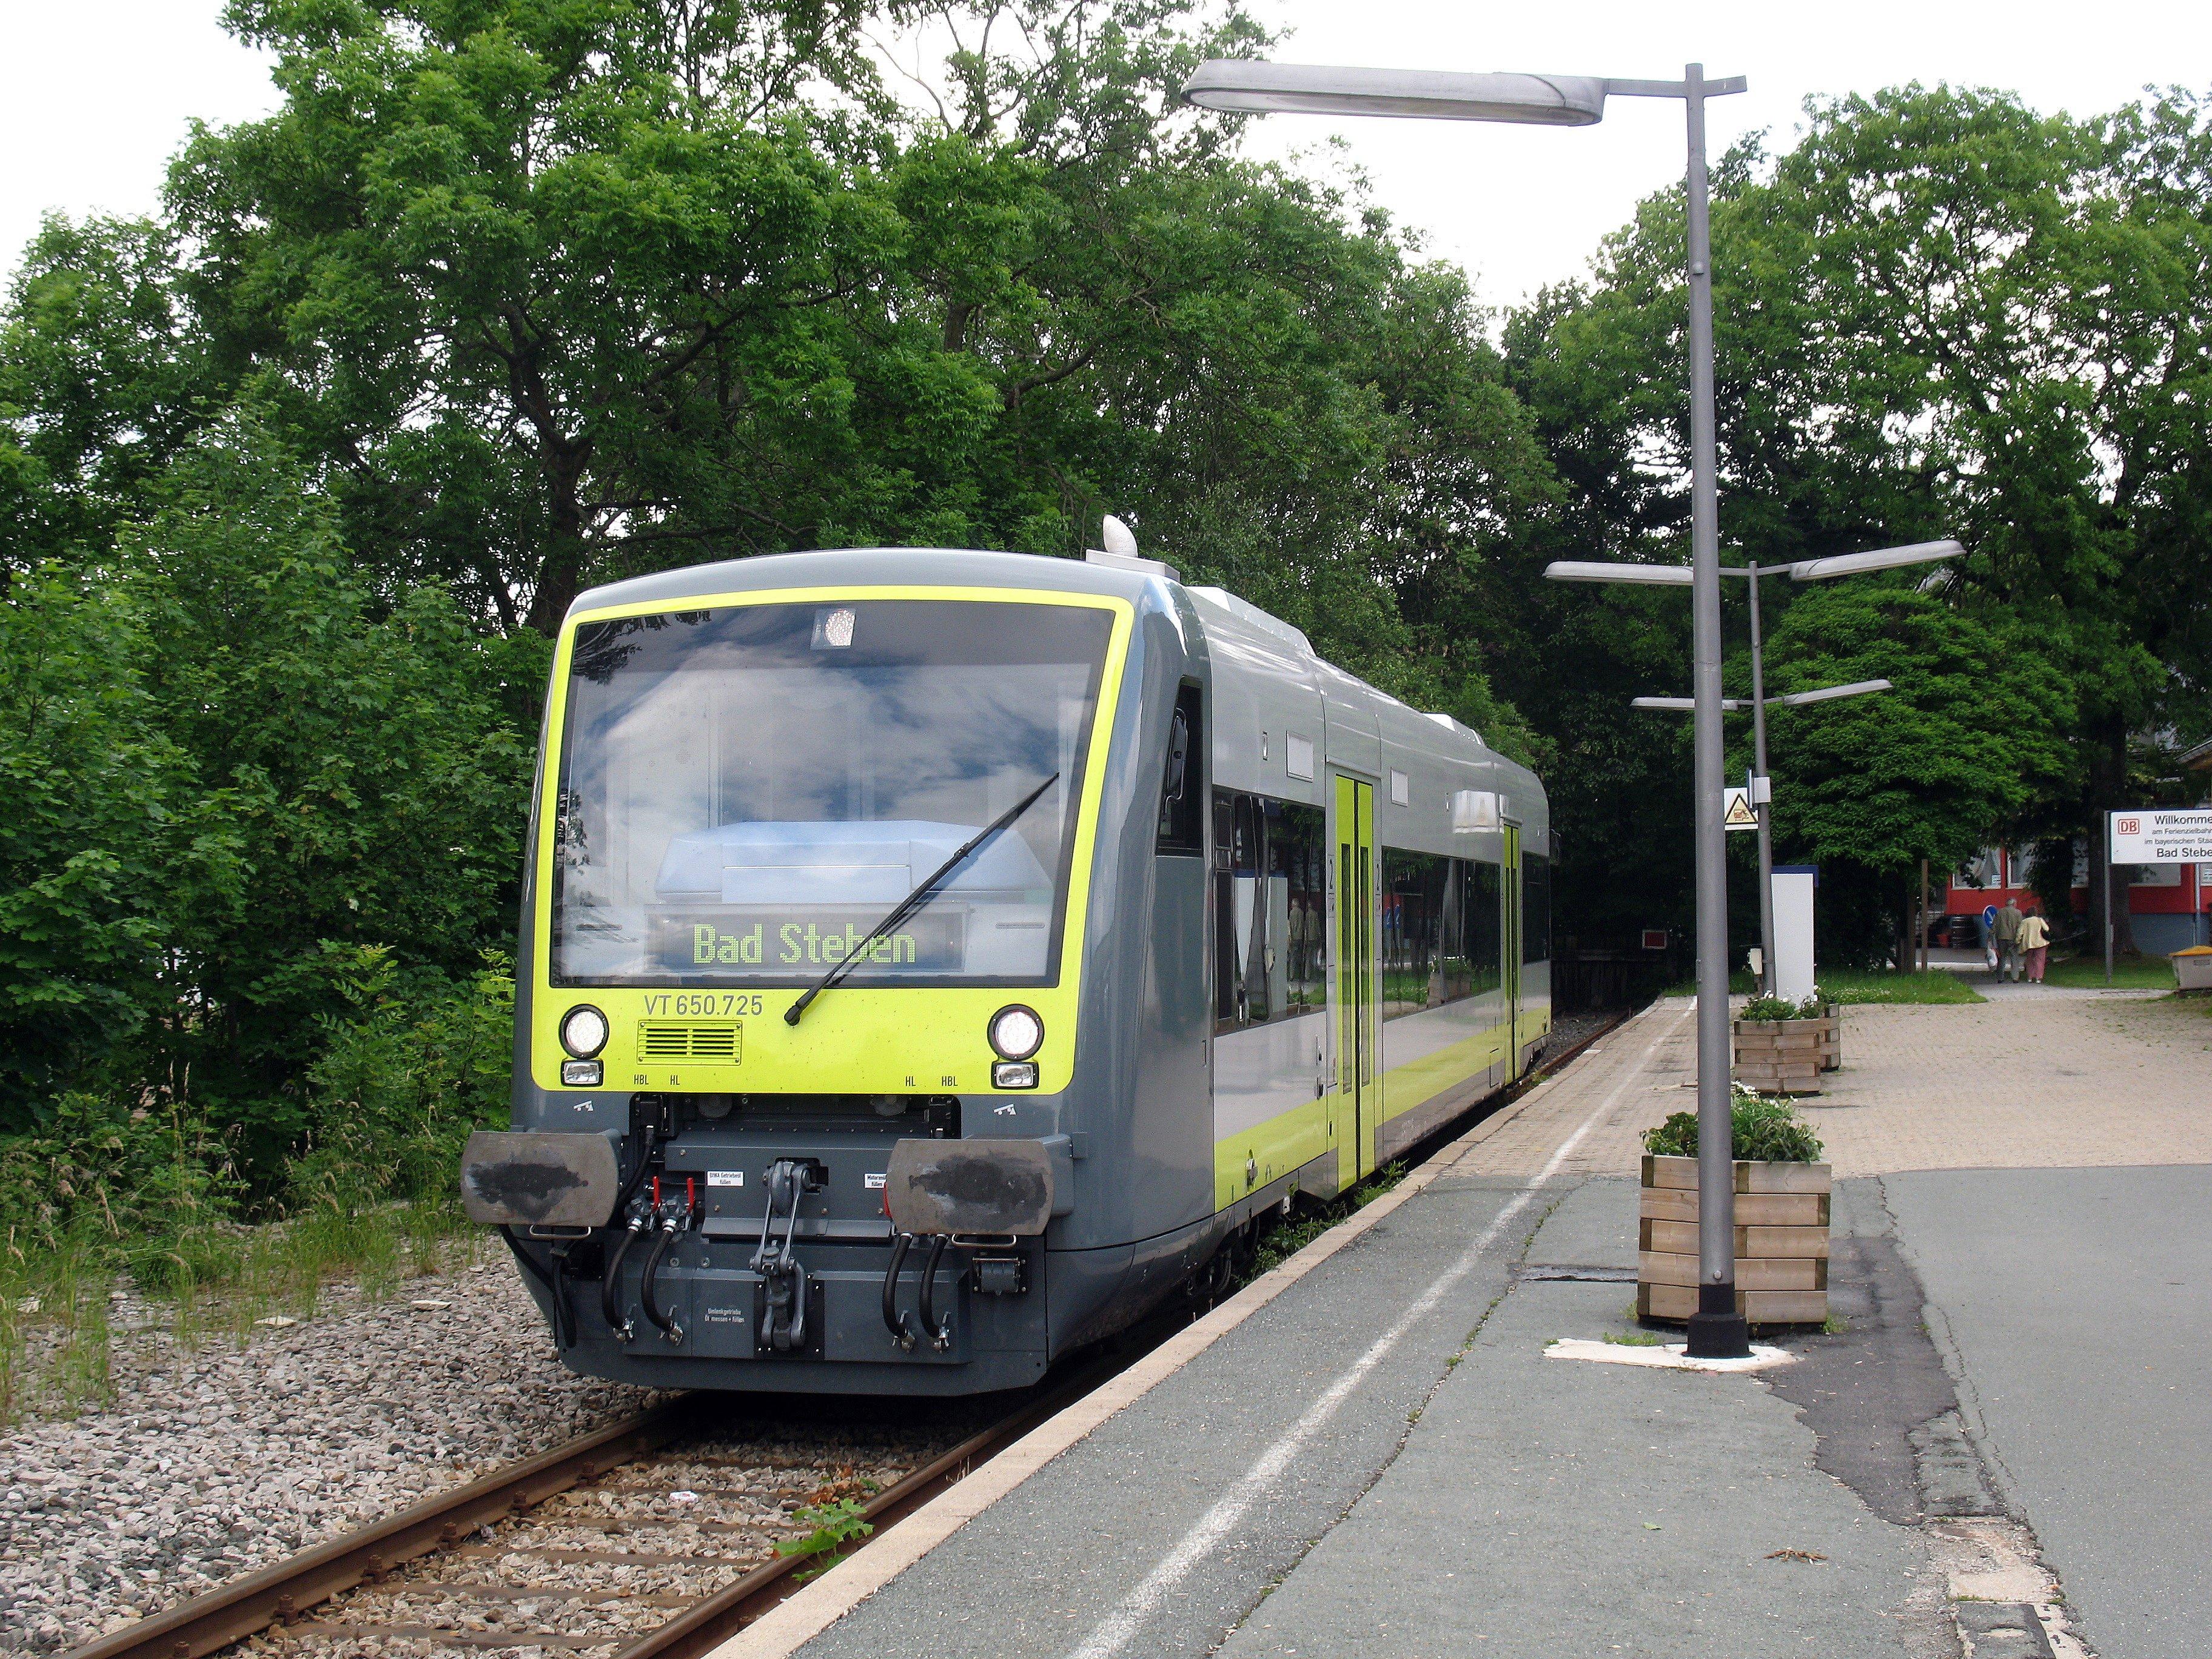 Bahnhof Bad Steben